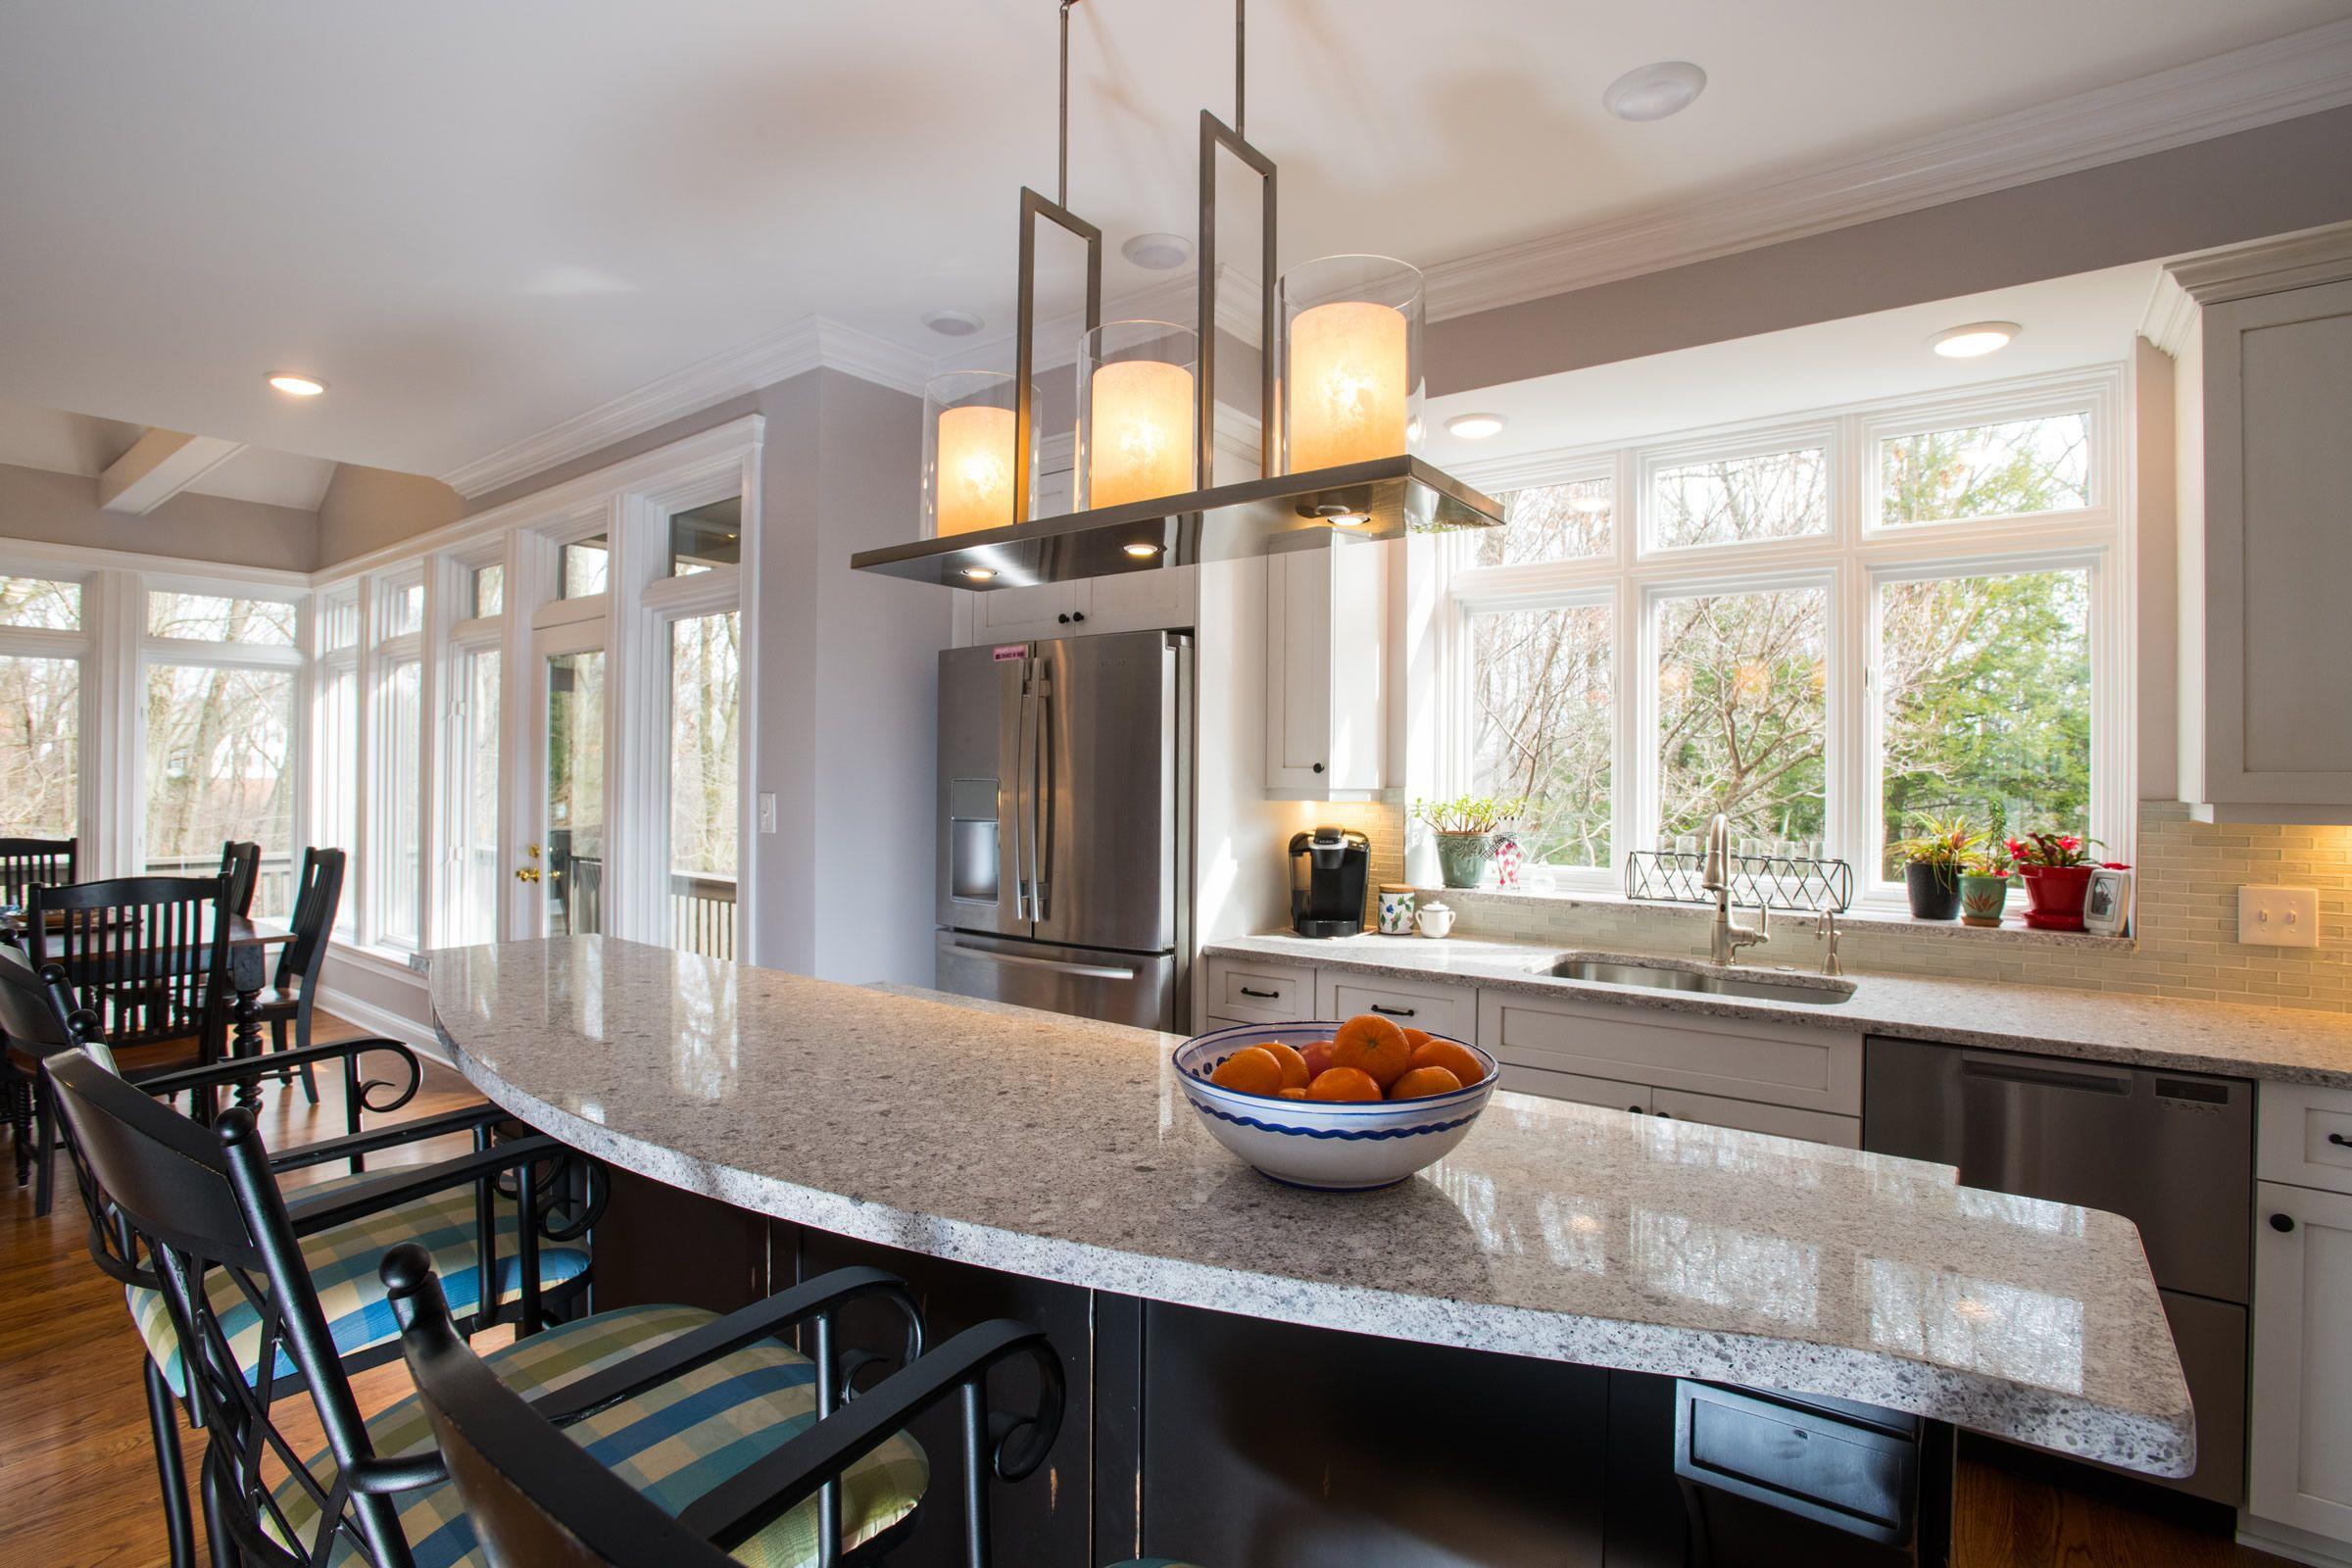 pinmorrison kitchen & bath on morrison kitchen gra18 | complete kitchens, kitchen, wine